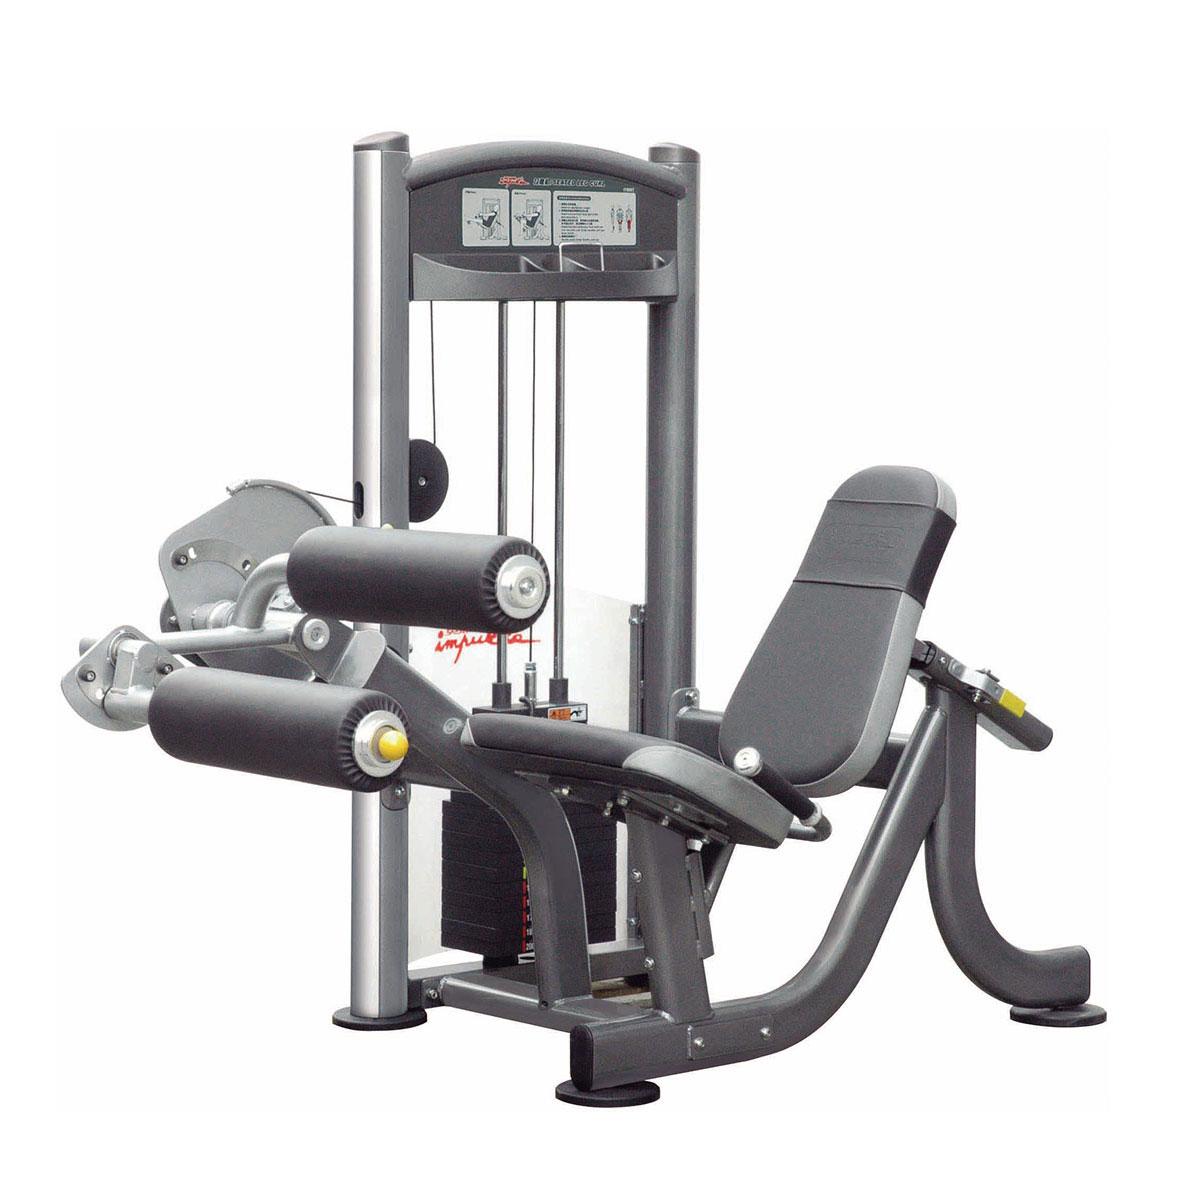 Leg extension - 200 lbs